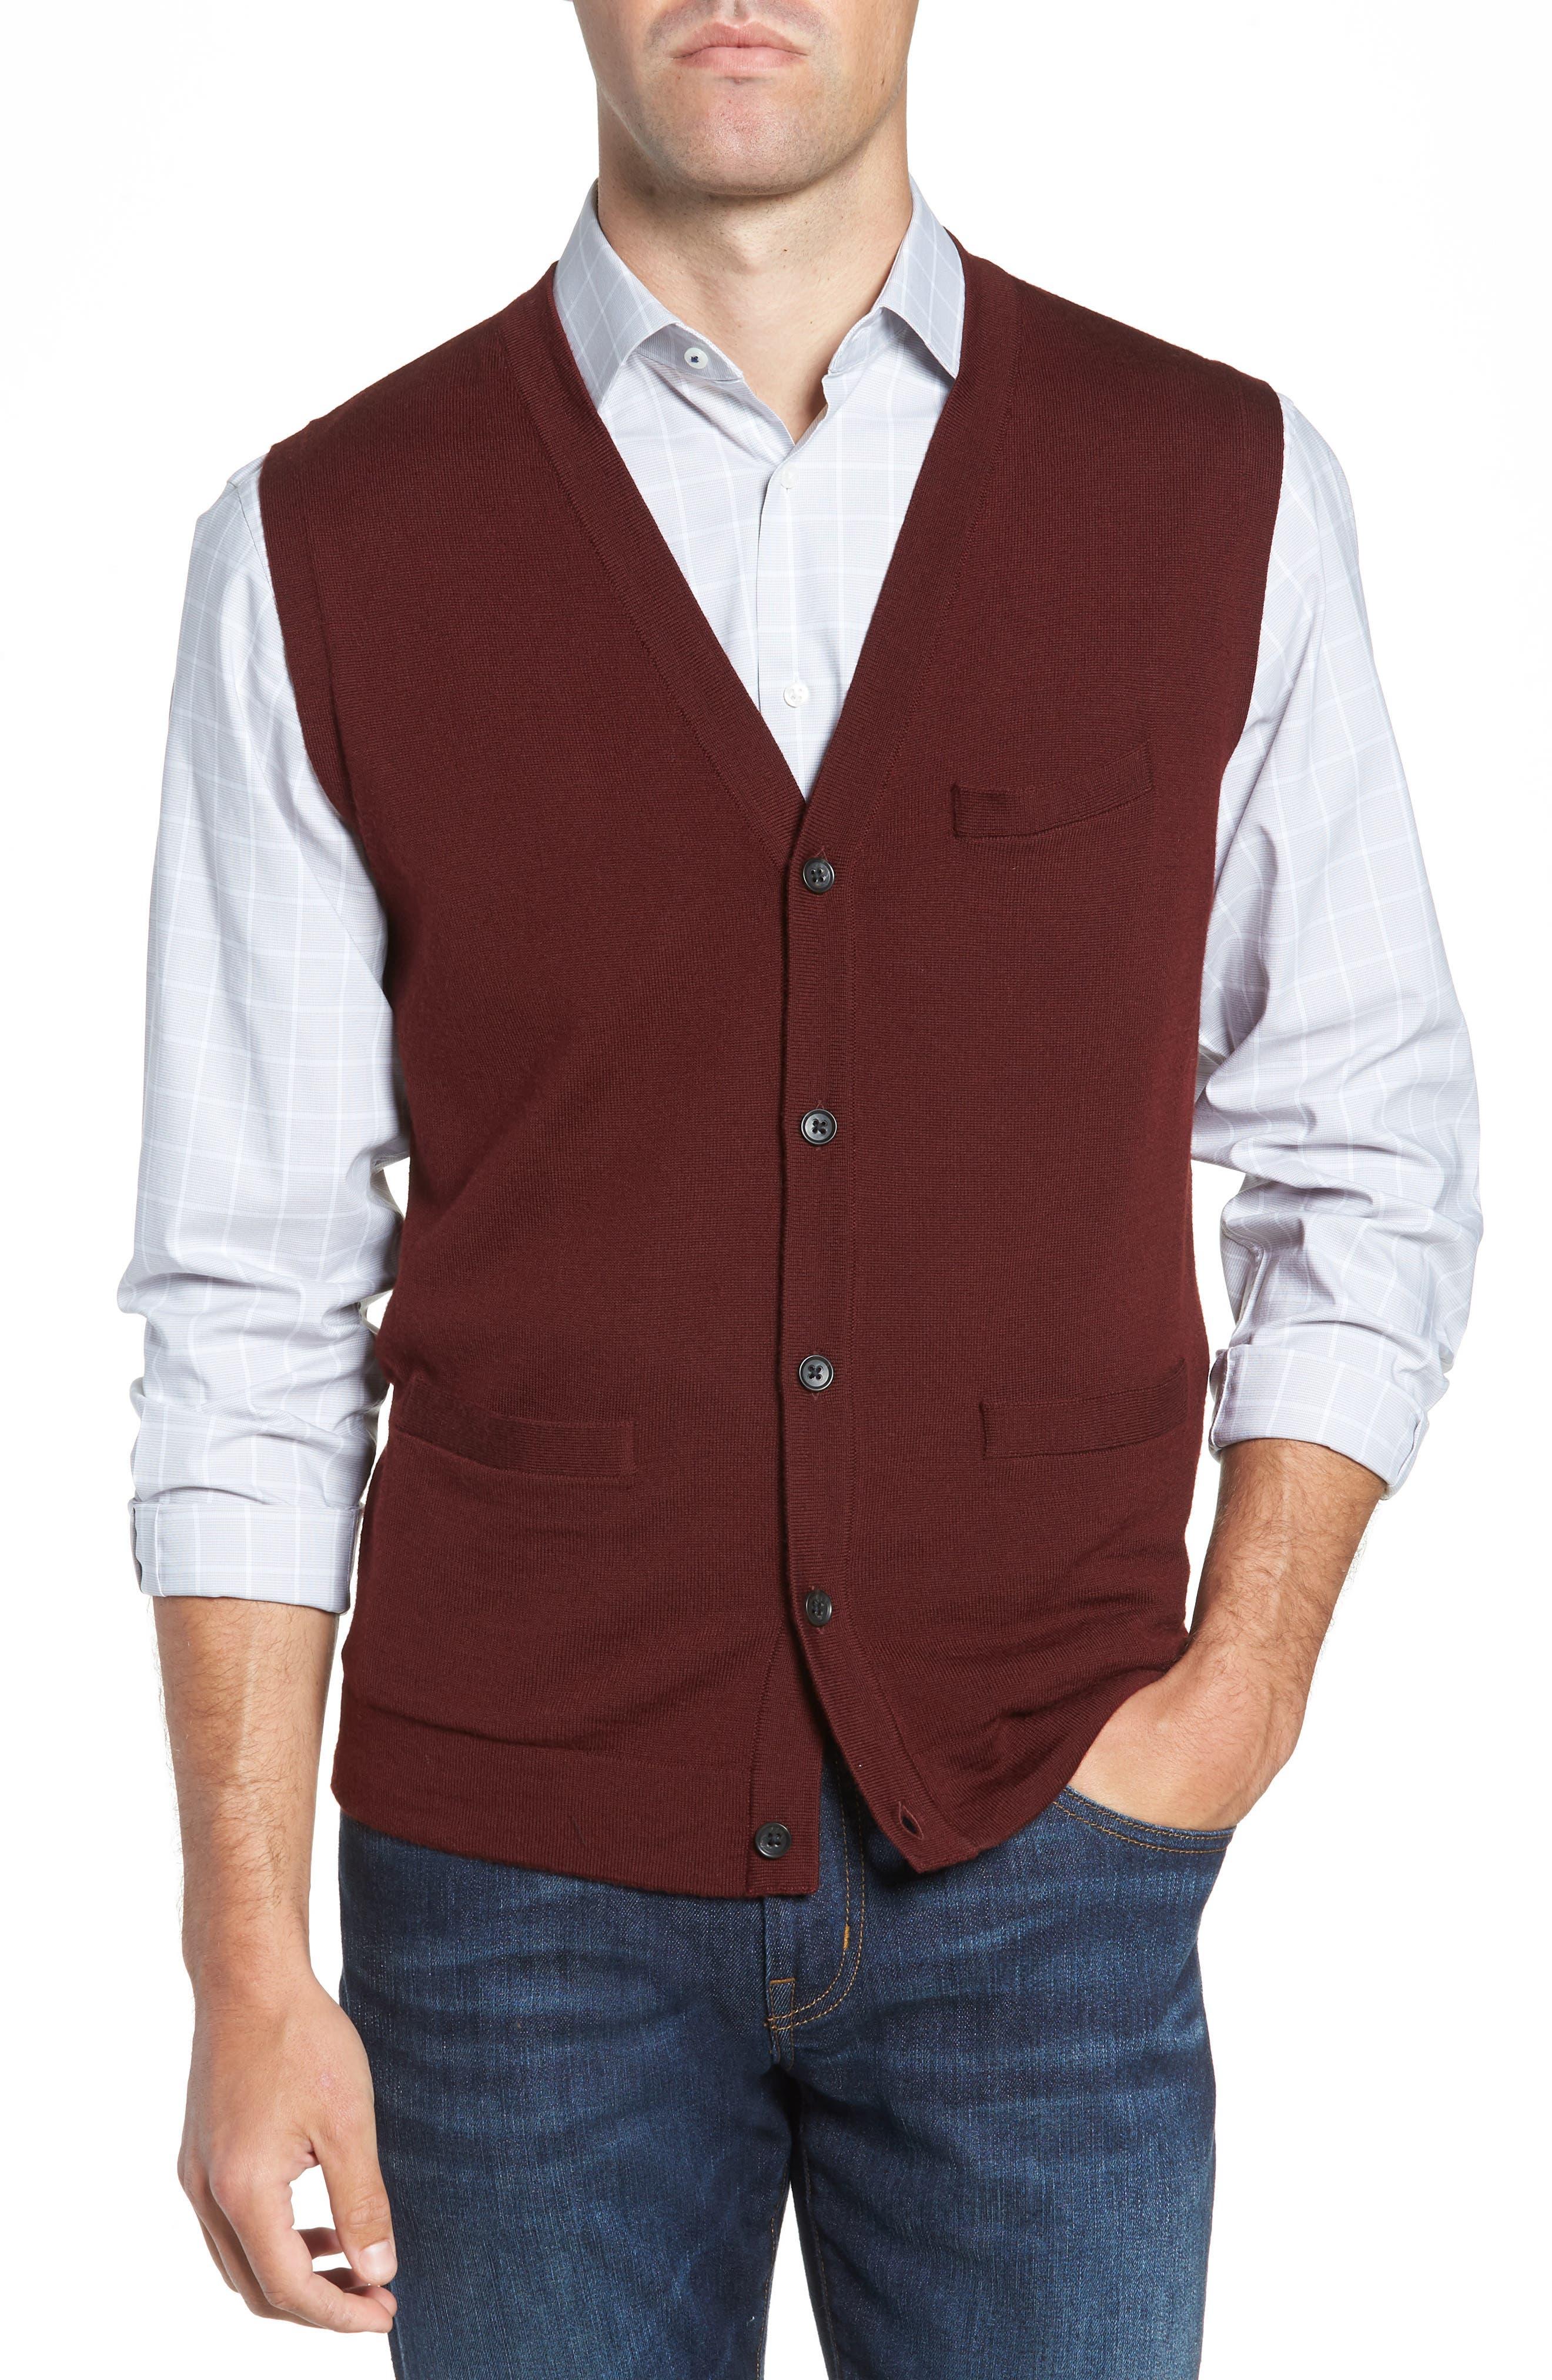 Merino Button Front Sweater Vest,                             Main thumbnail 1, color,                             Burgundy Royale